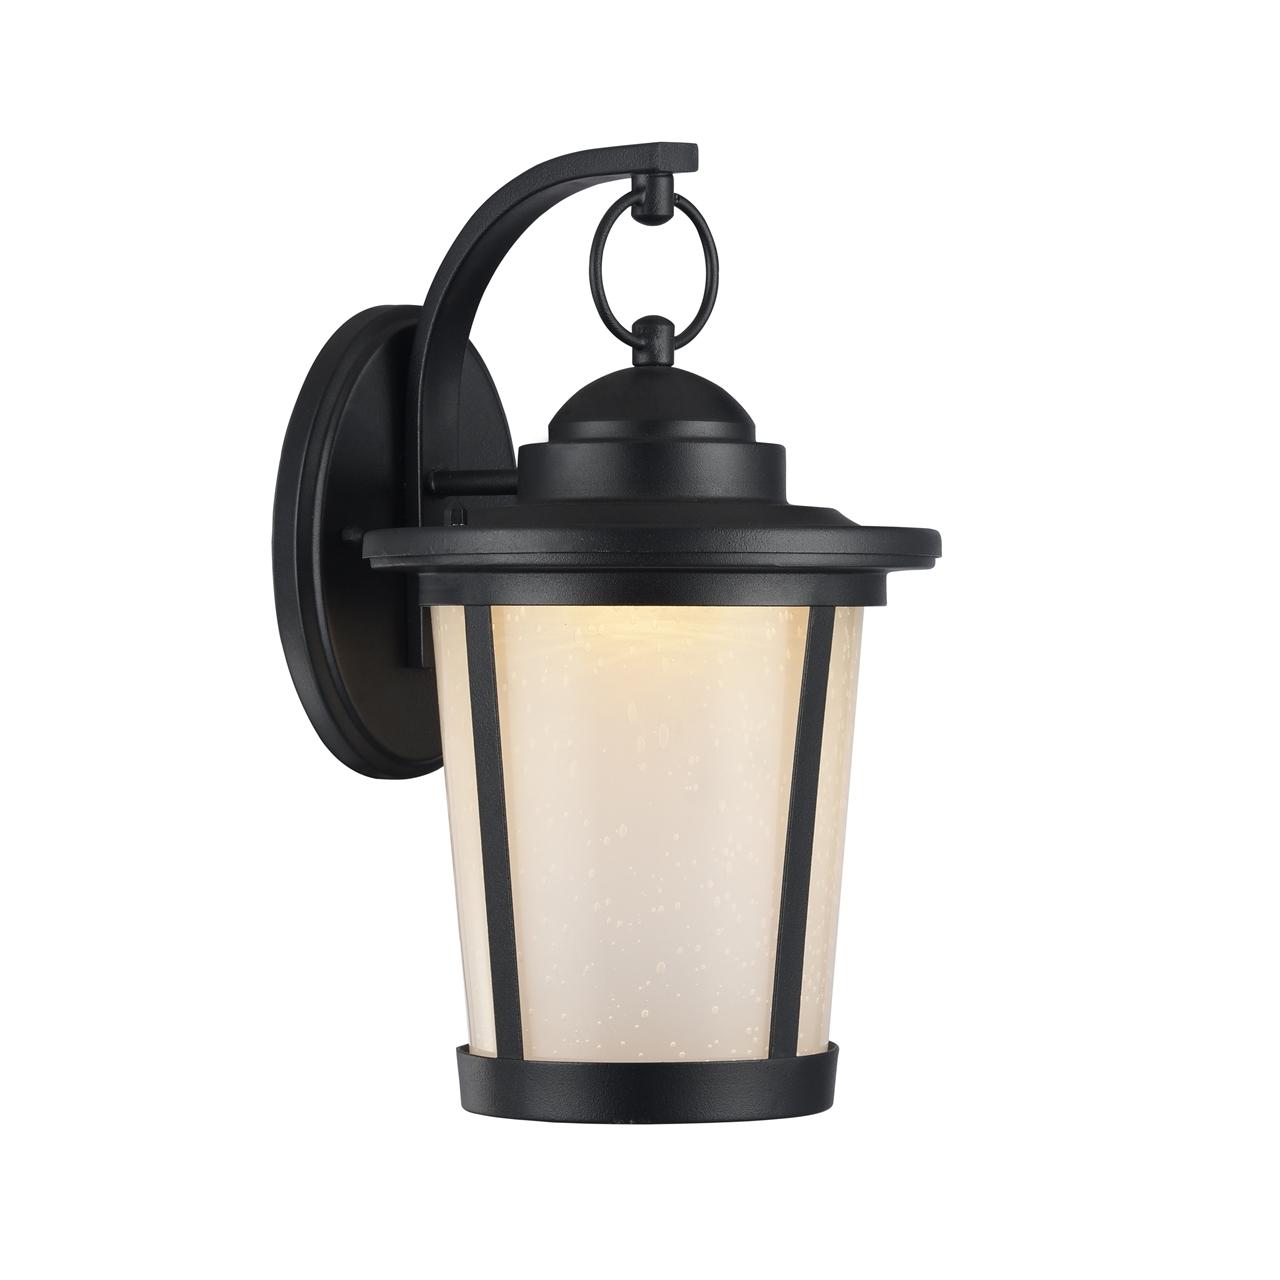 CHLOE Lighting, Inc CHLOE Lighting ABBINGTON Transitional ... on Modern Outdoor Wall Sconce id=45620